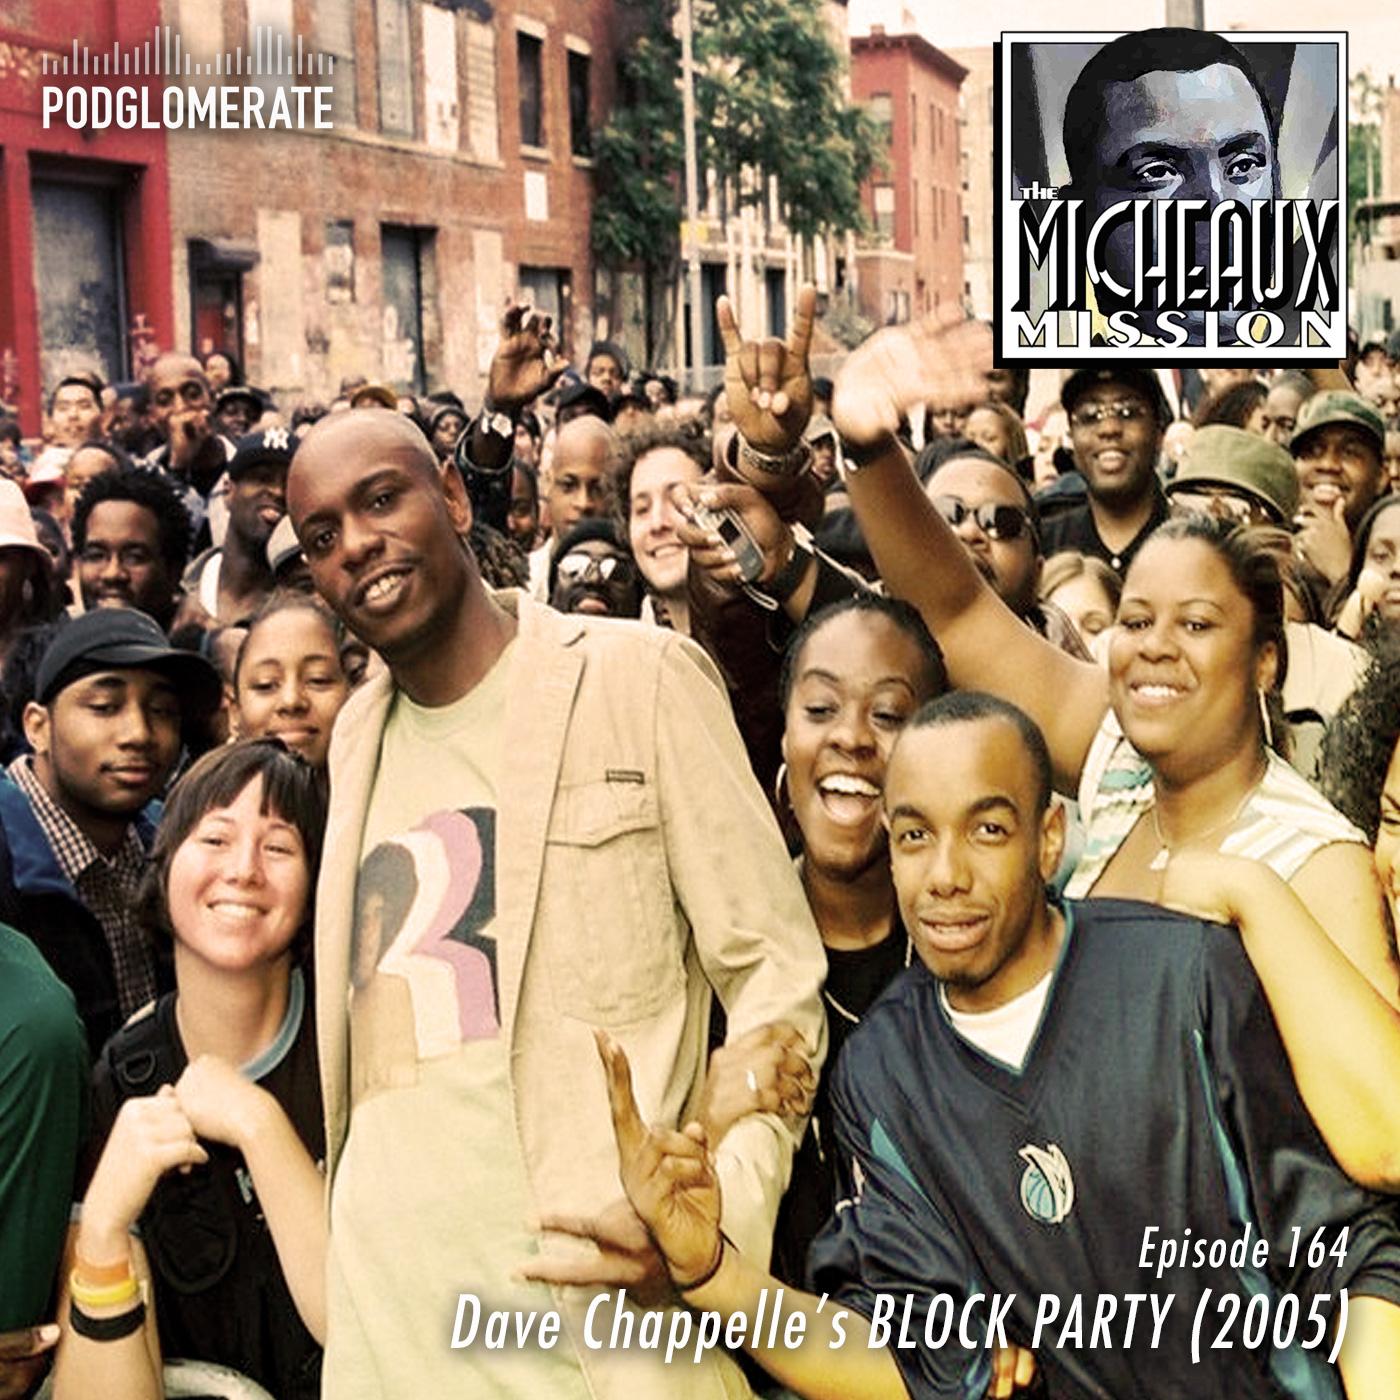 Dave Chappelle's BLOCK PARTY (2005) w Toya Haynes